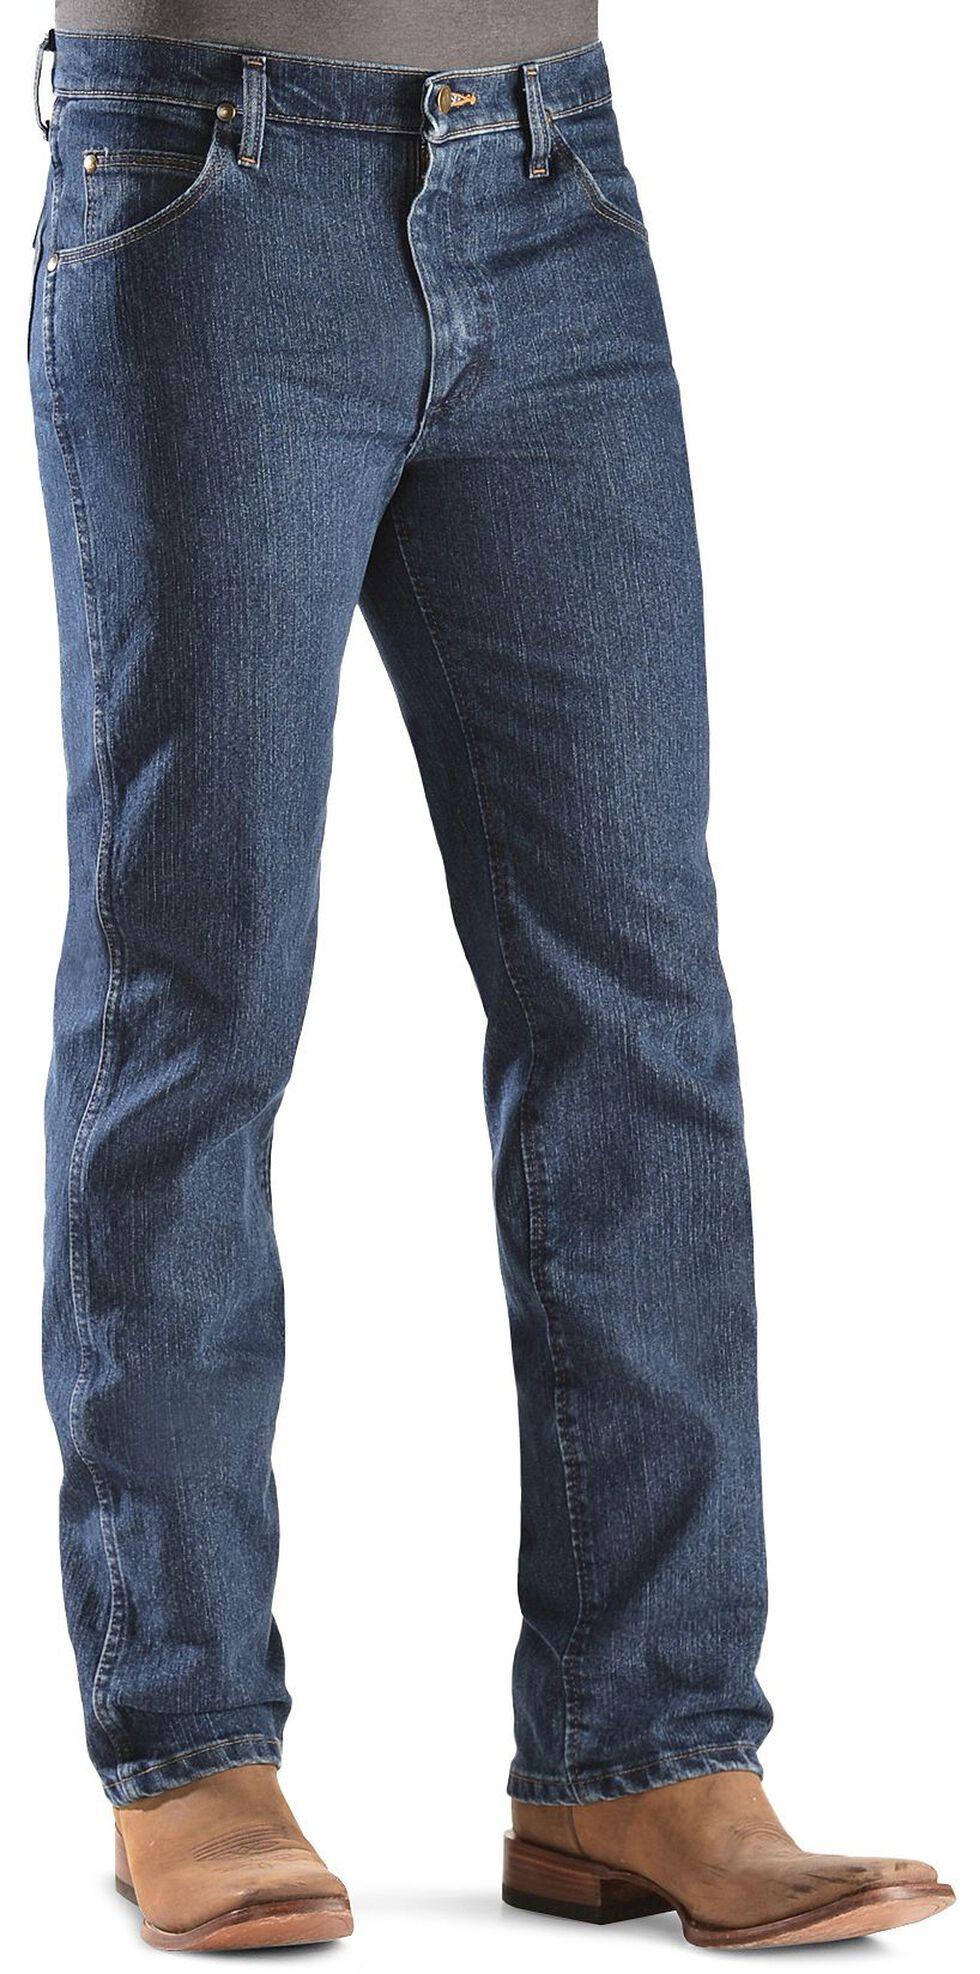 Wrangler Advanced Comfort Slim Fit Jeans - Reg, Dark Denim, hi-res